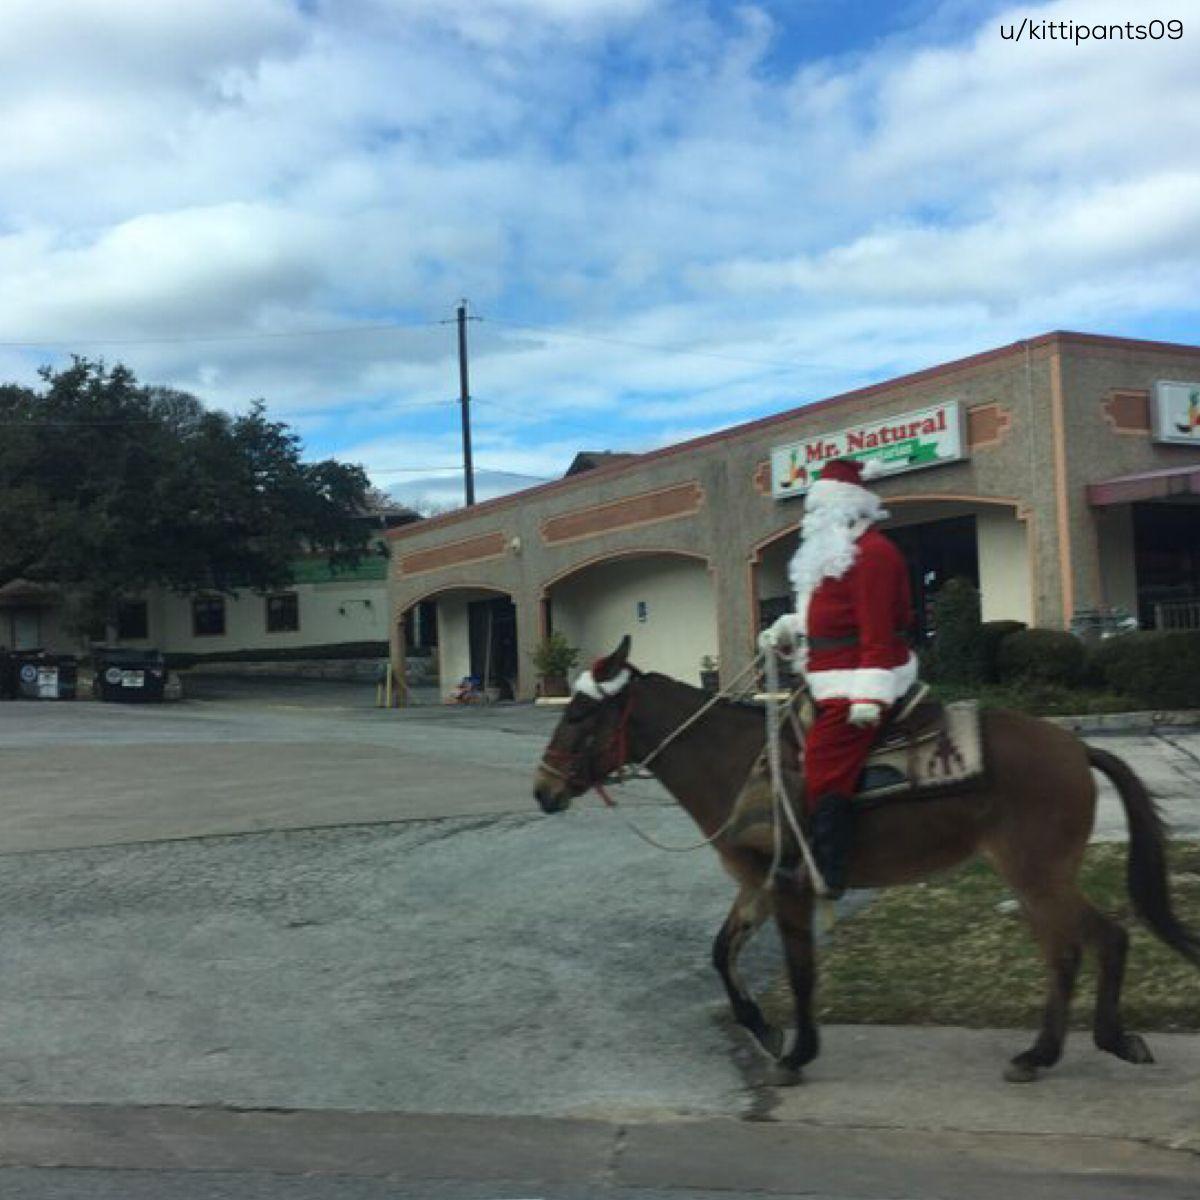 Santa's gettin' an early start in Texas <br>http://pic.twitter.com/cr55DCh5Qm